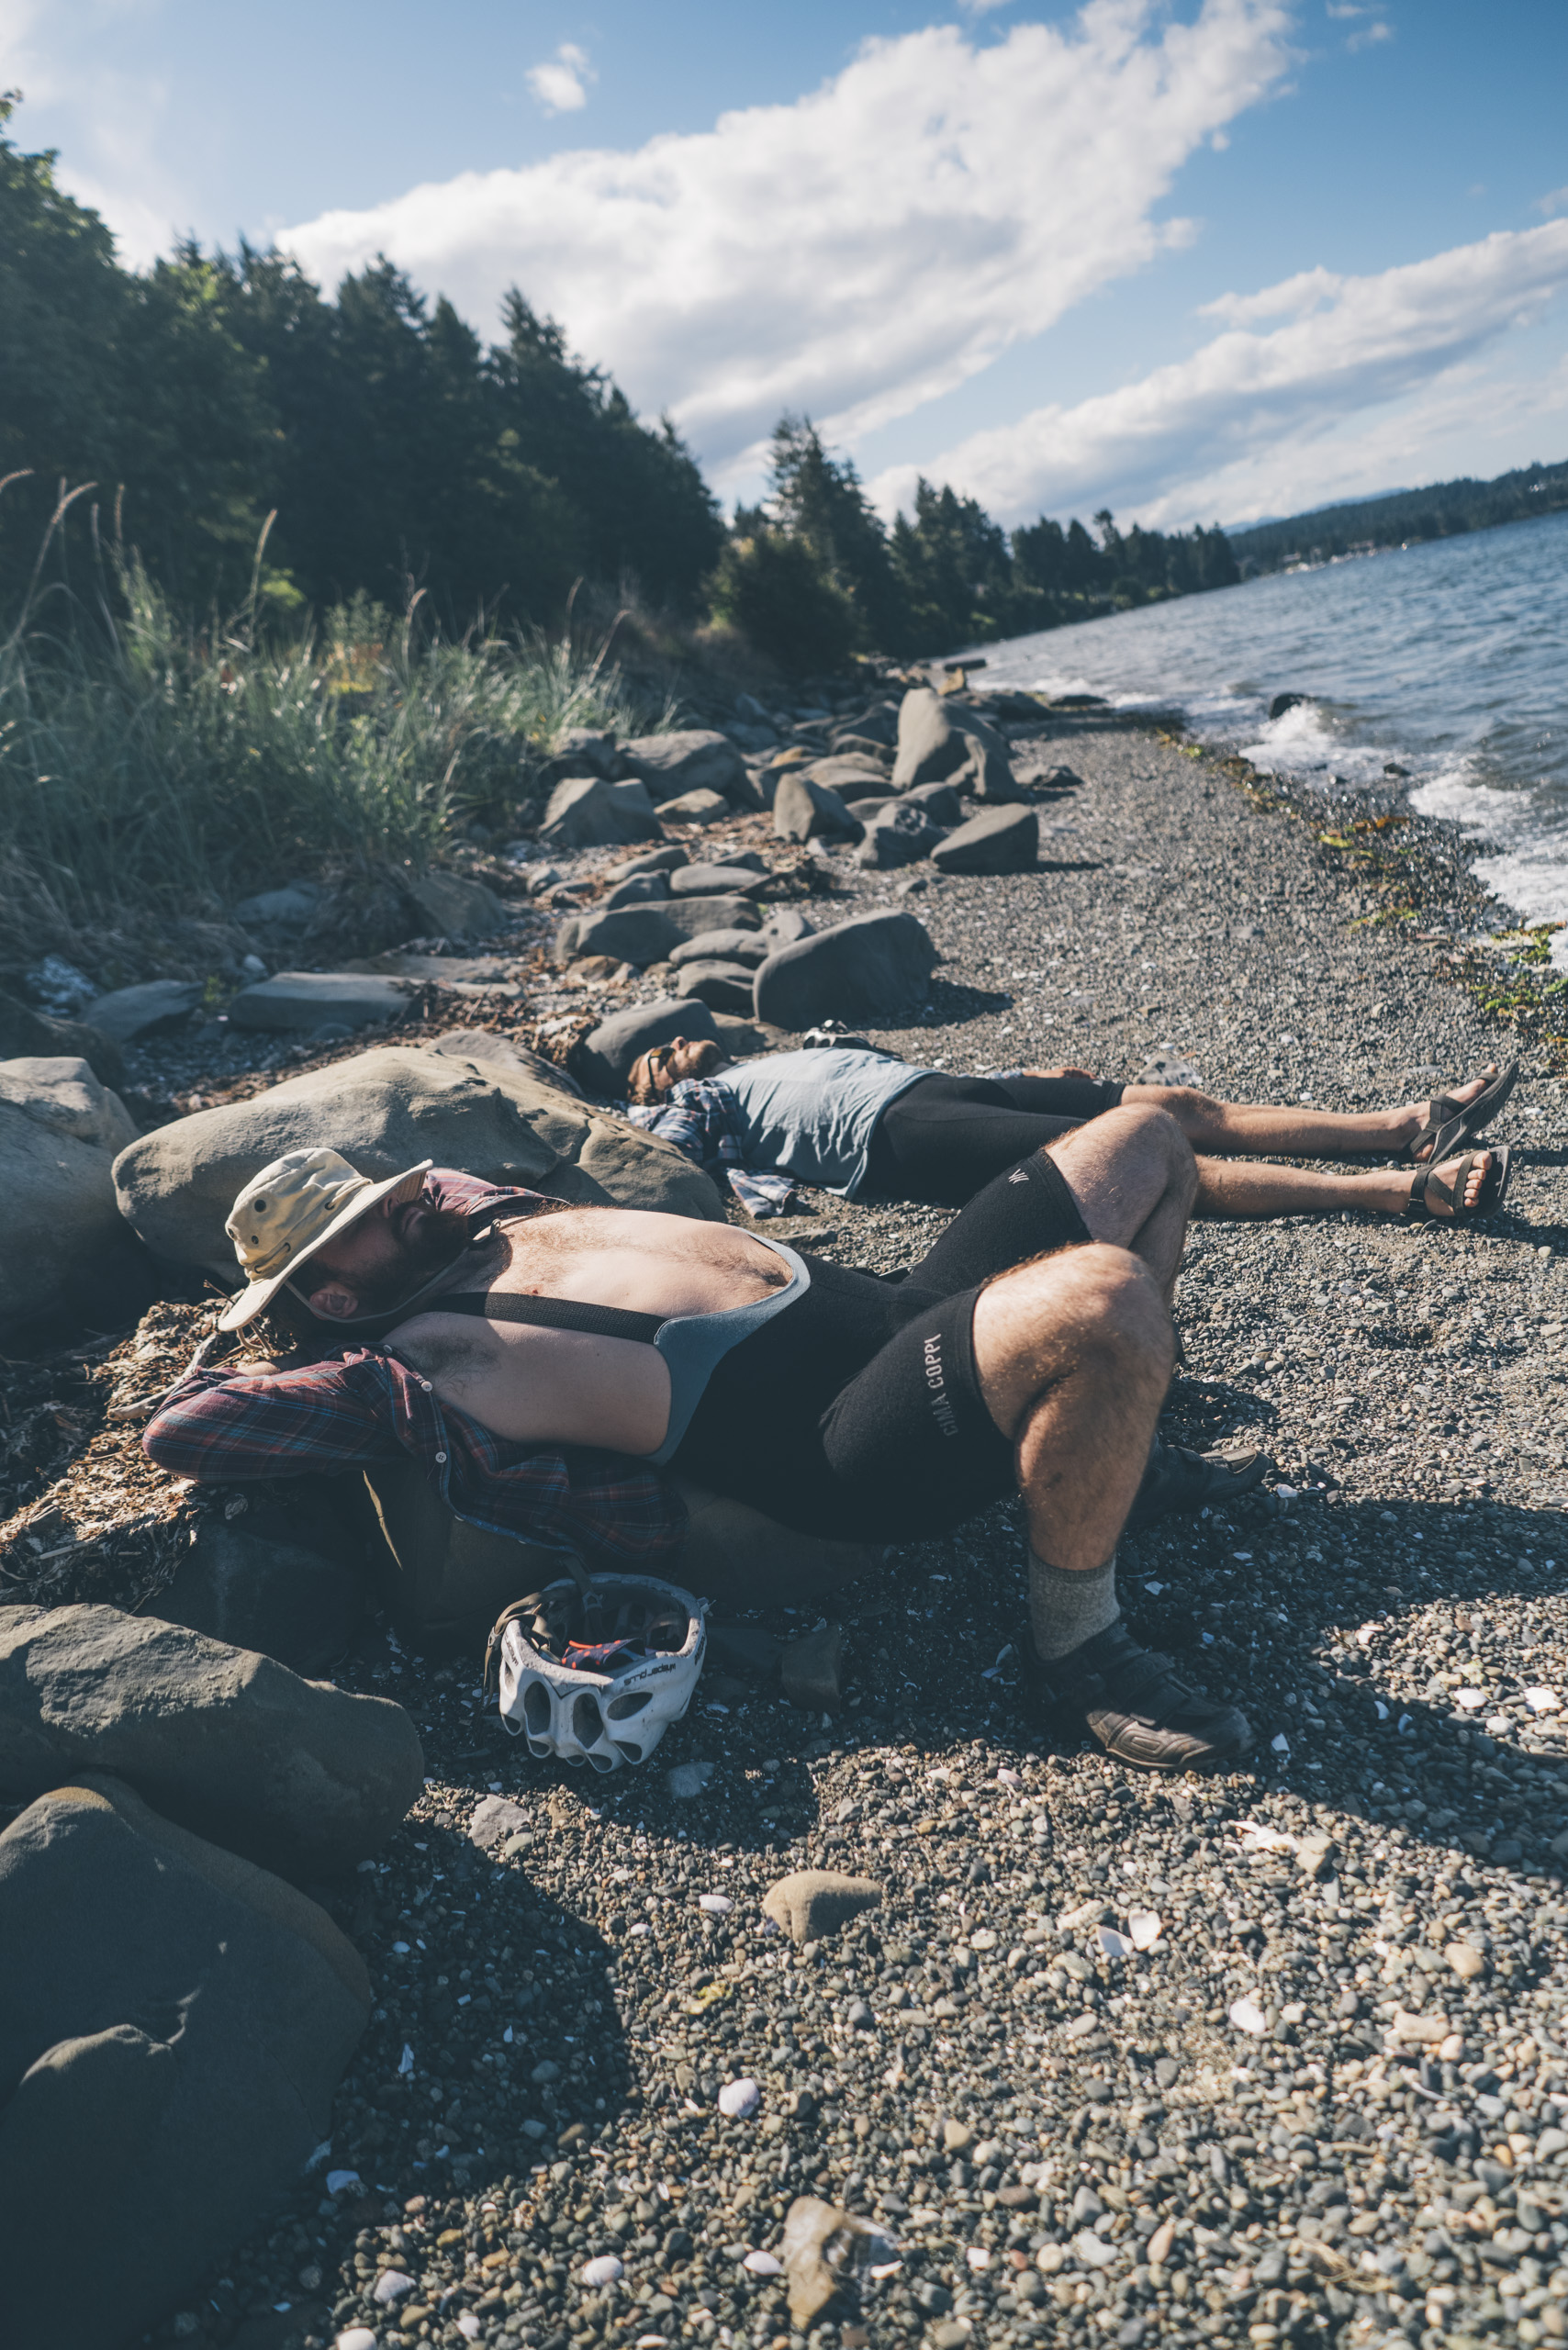 Bikepacking-VanIsland-JohnsonStudios-201806-284.jpg